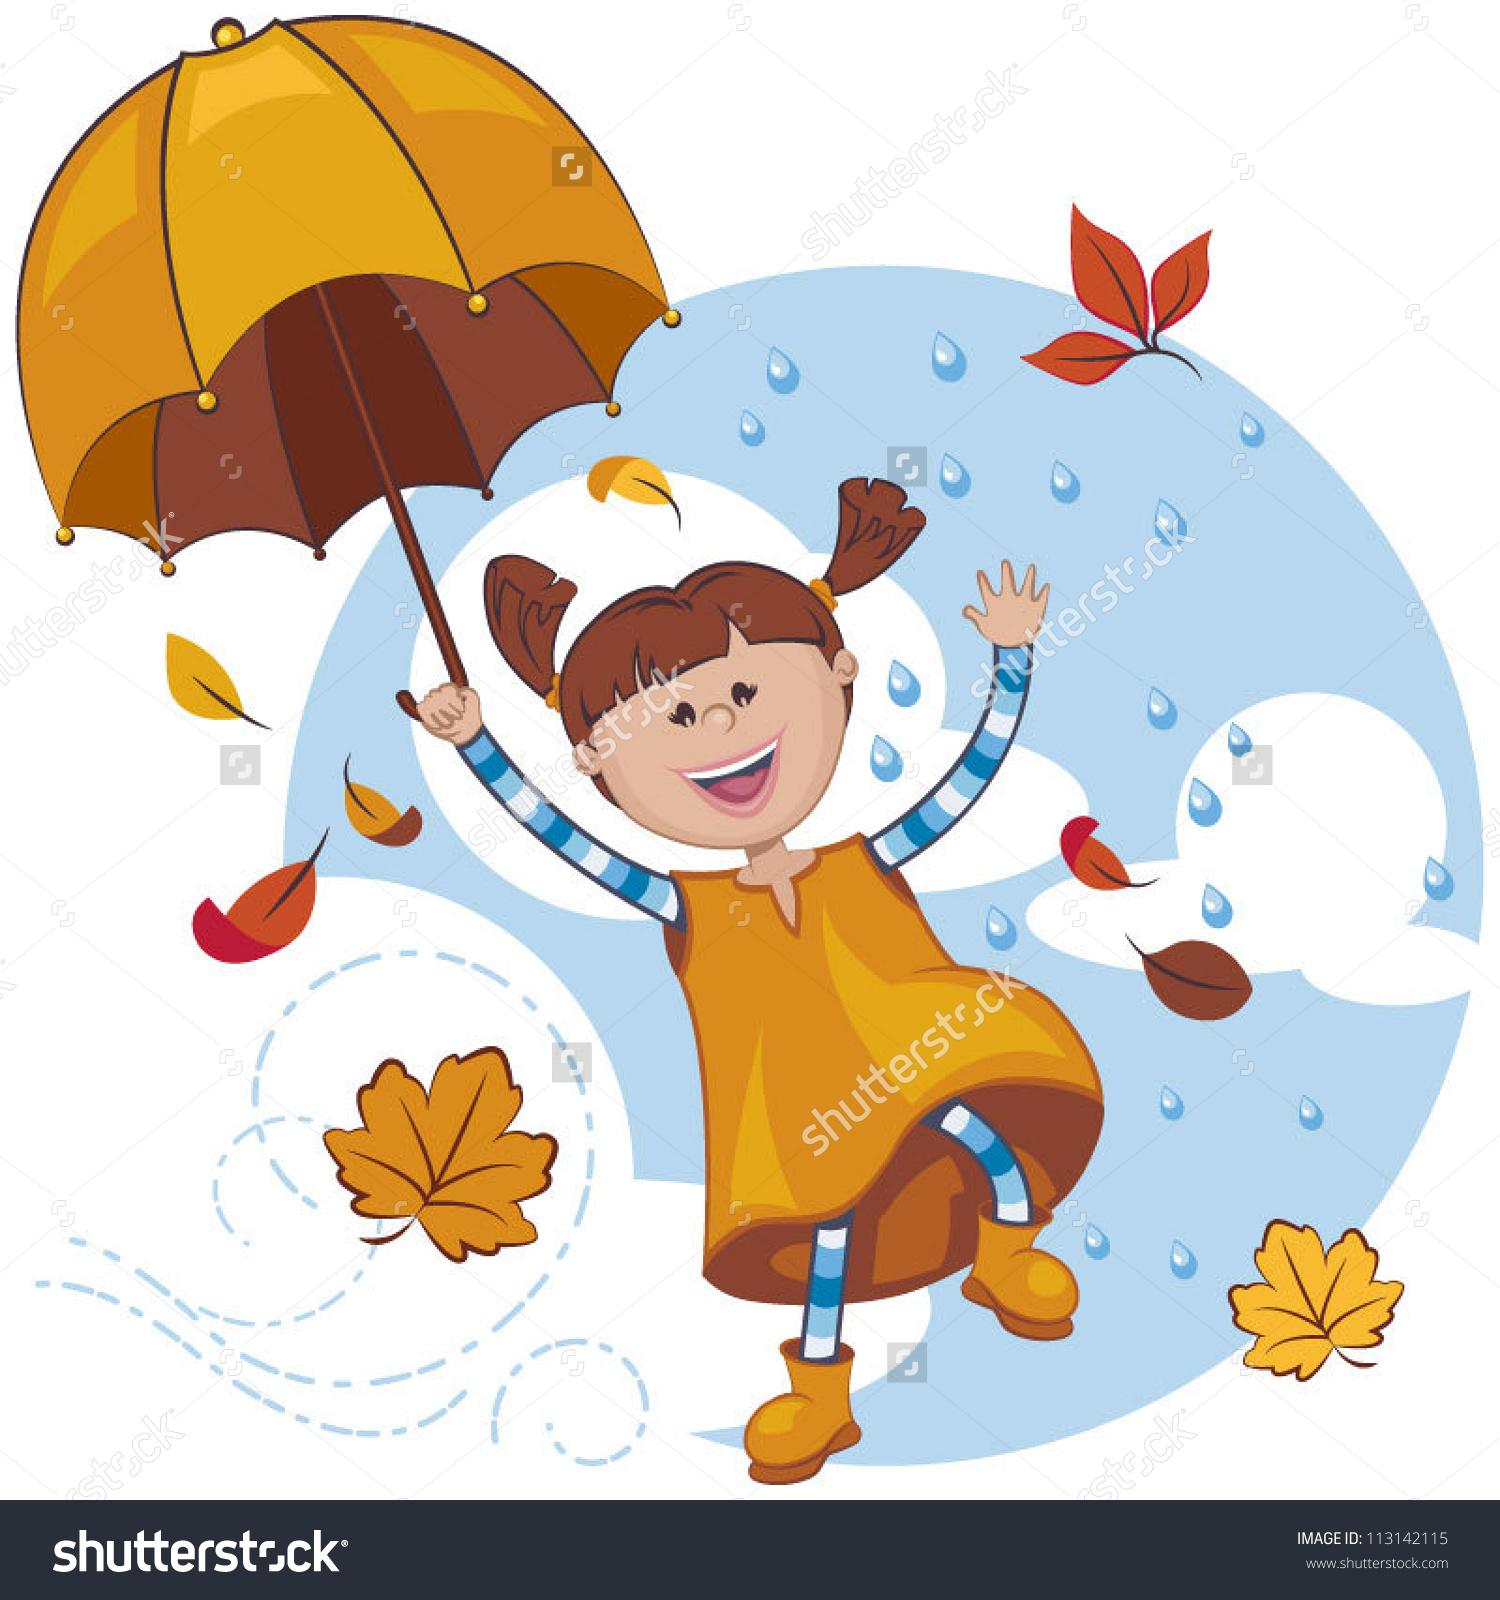 Illustration child umbrella playing. Baby girl autumn clipart